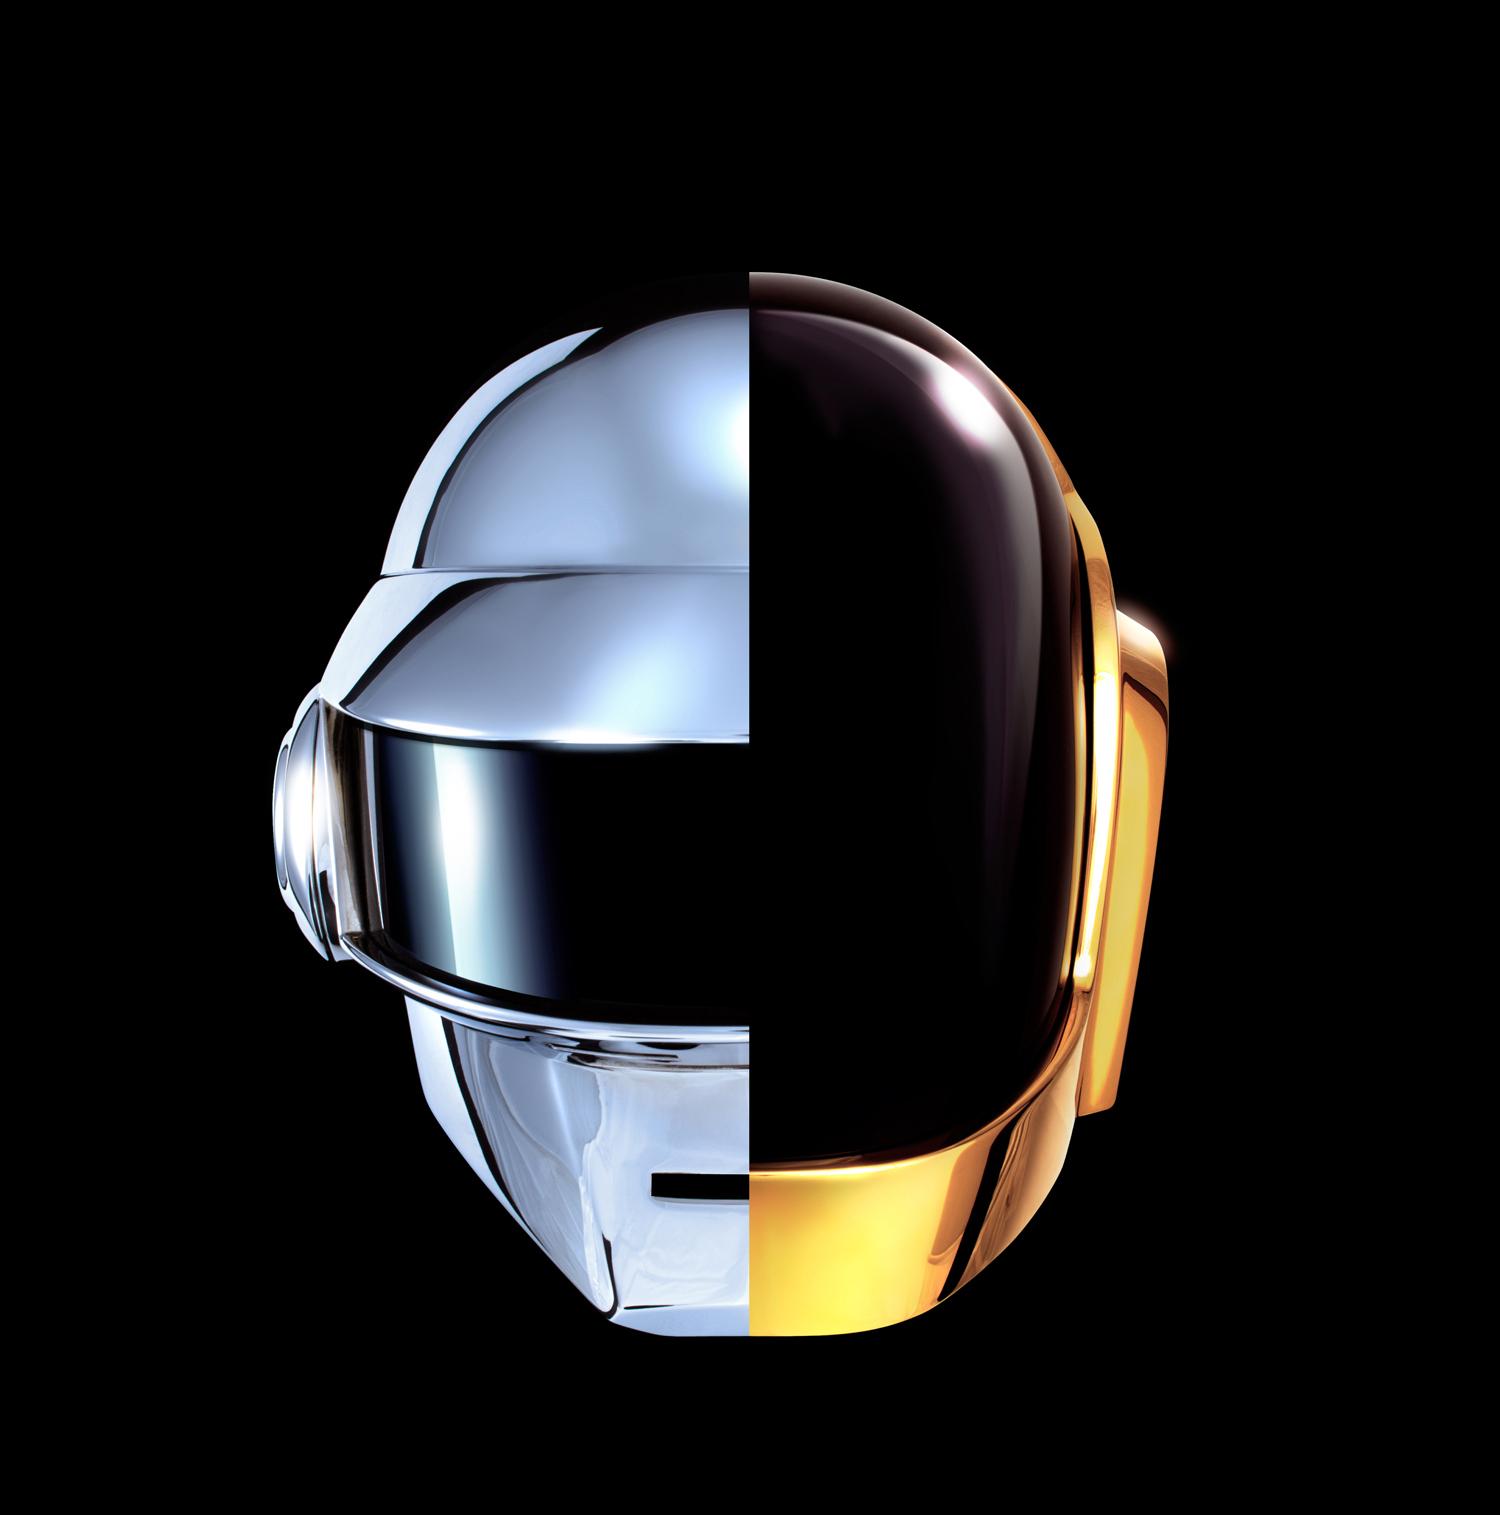 Copy of Daft Punk